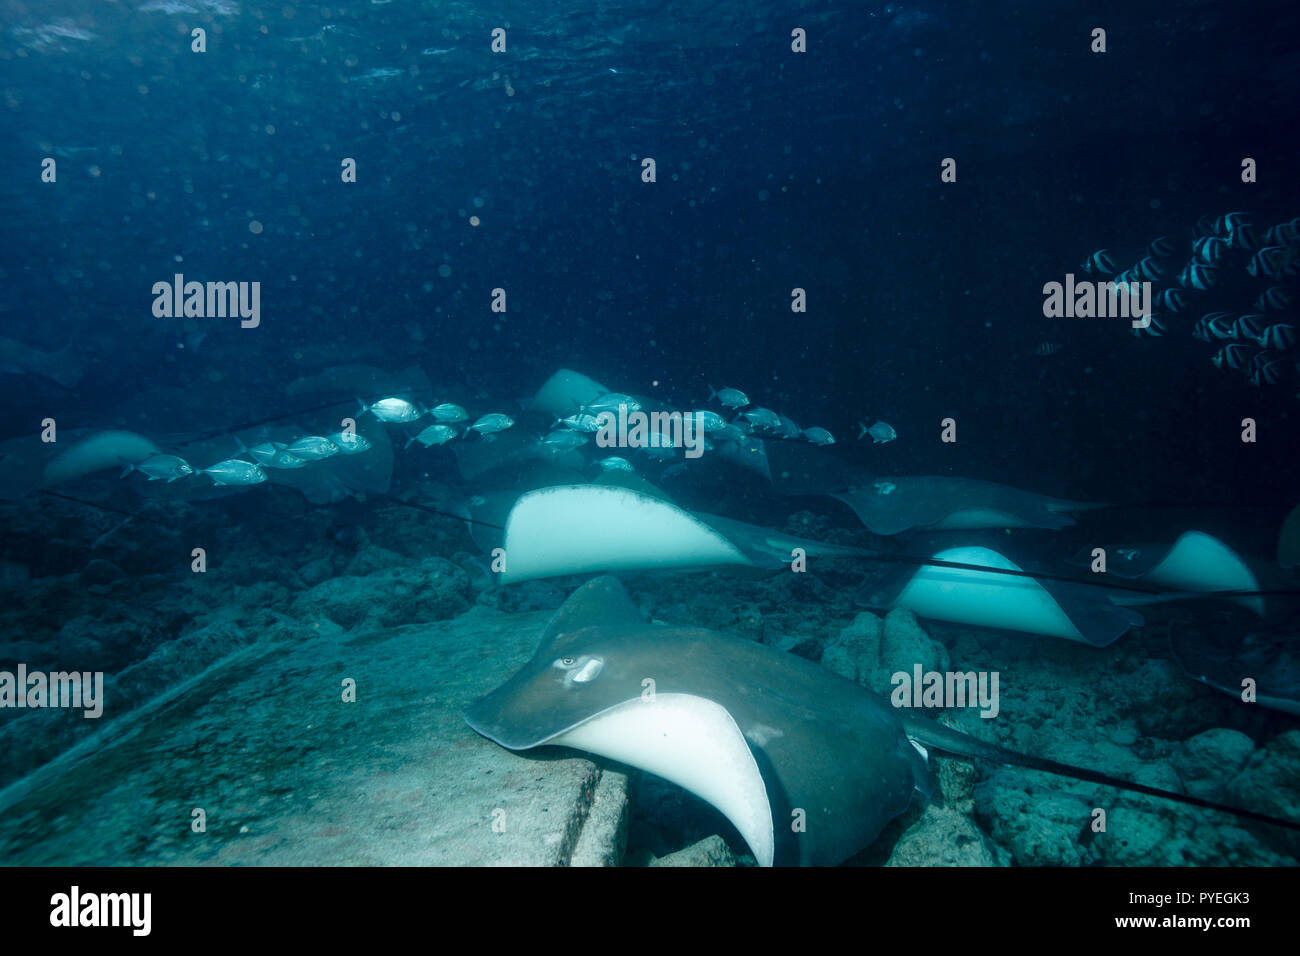 Stingray at Stingray city Maldives - Stock Image